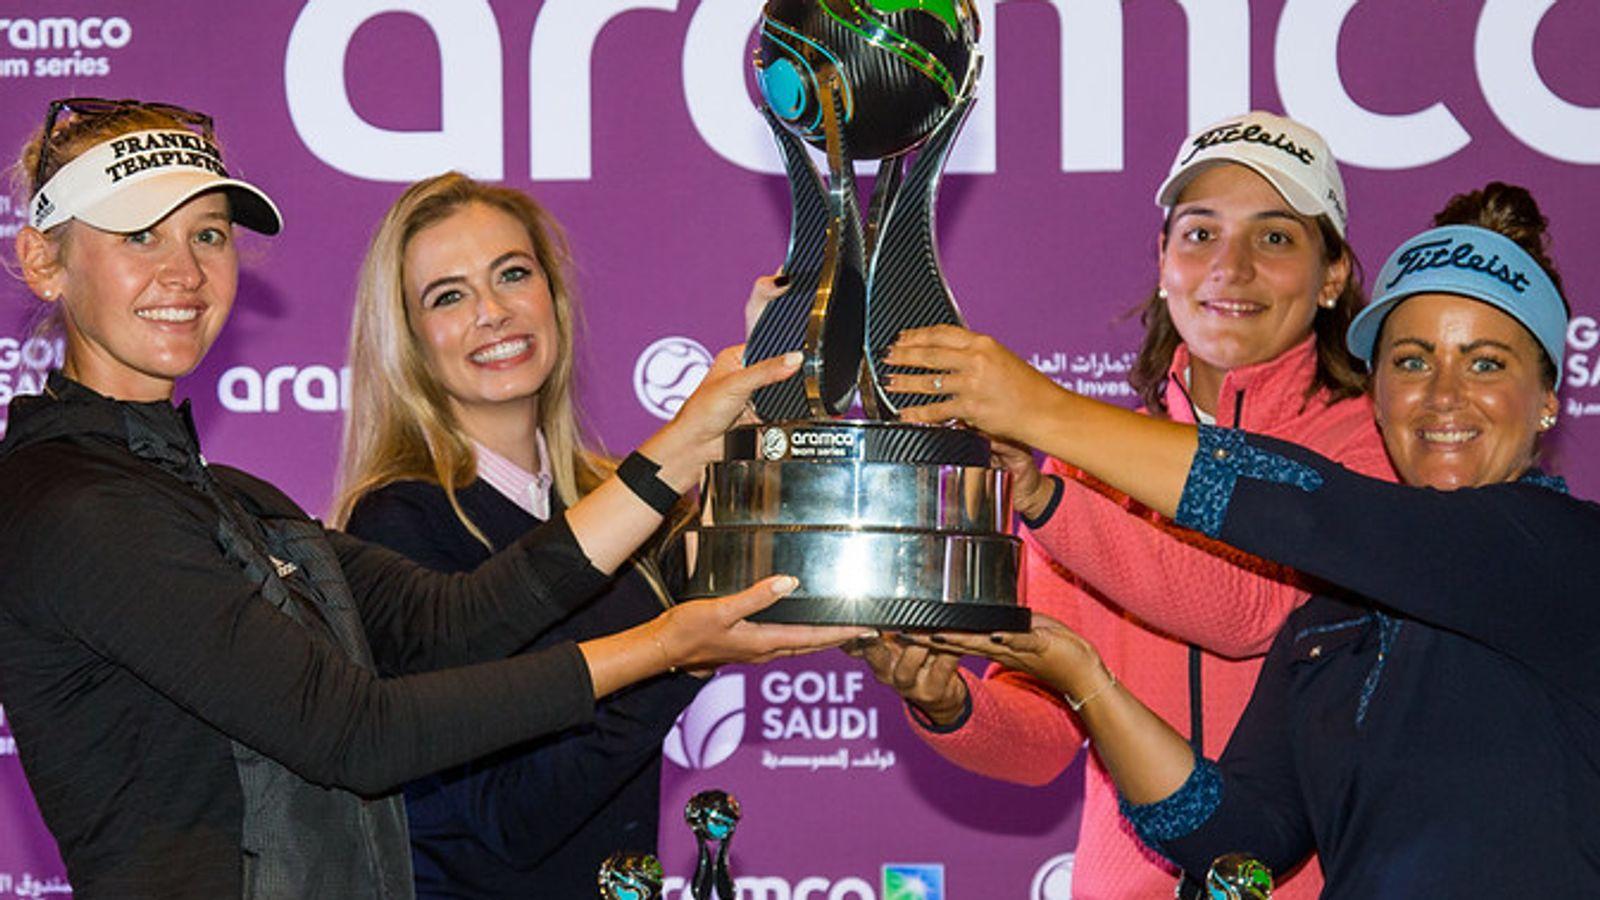 Aramco Team Series: Jessica Korda wins team event, Charley Hull claims individual crown